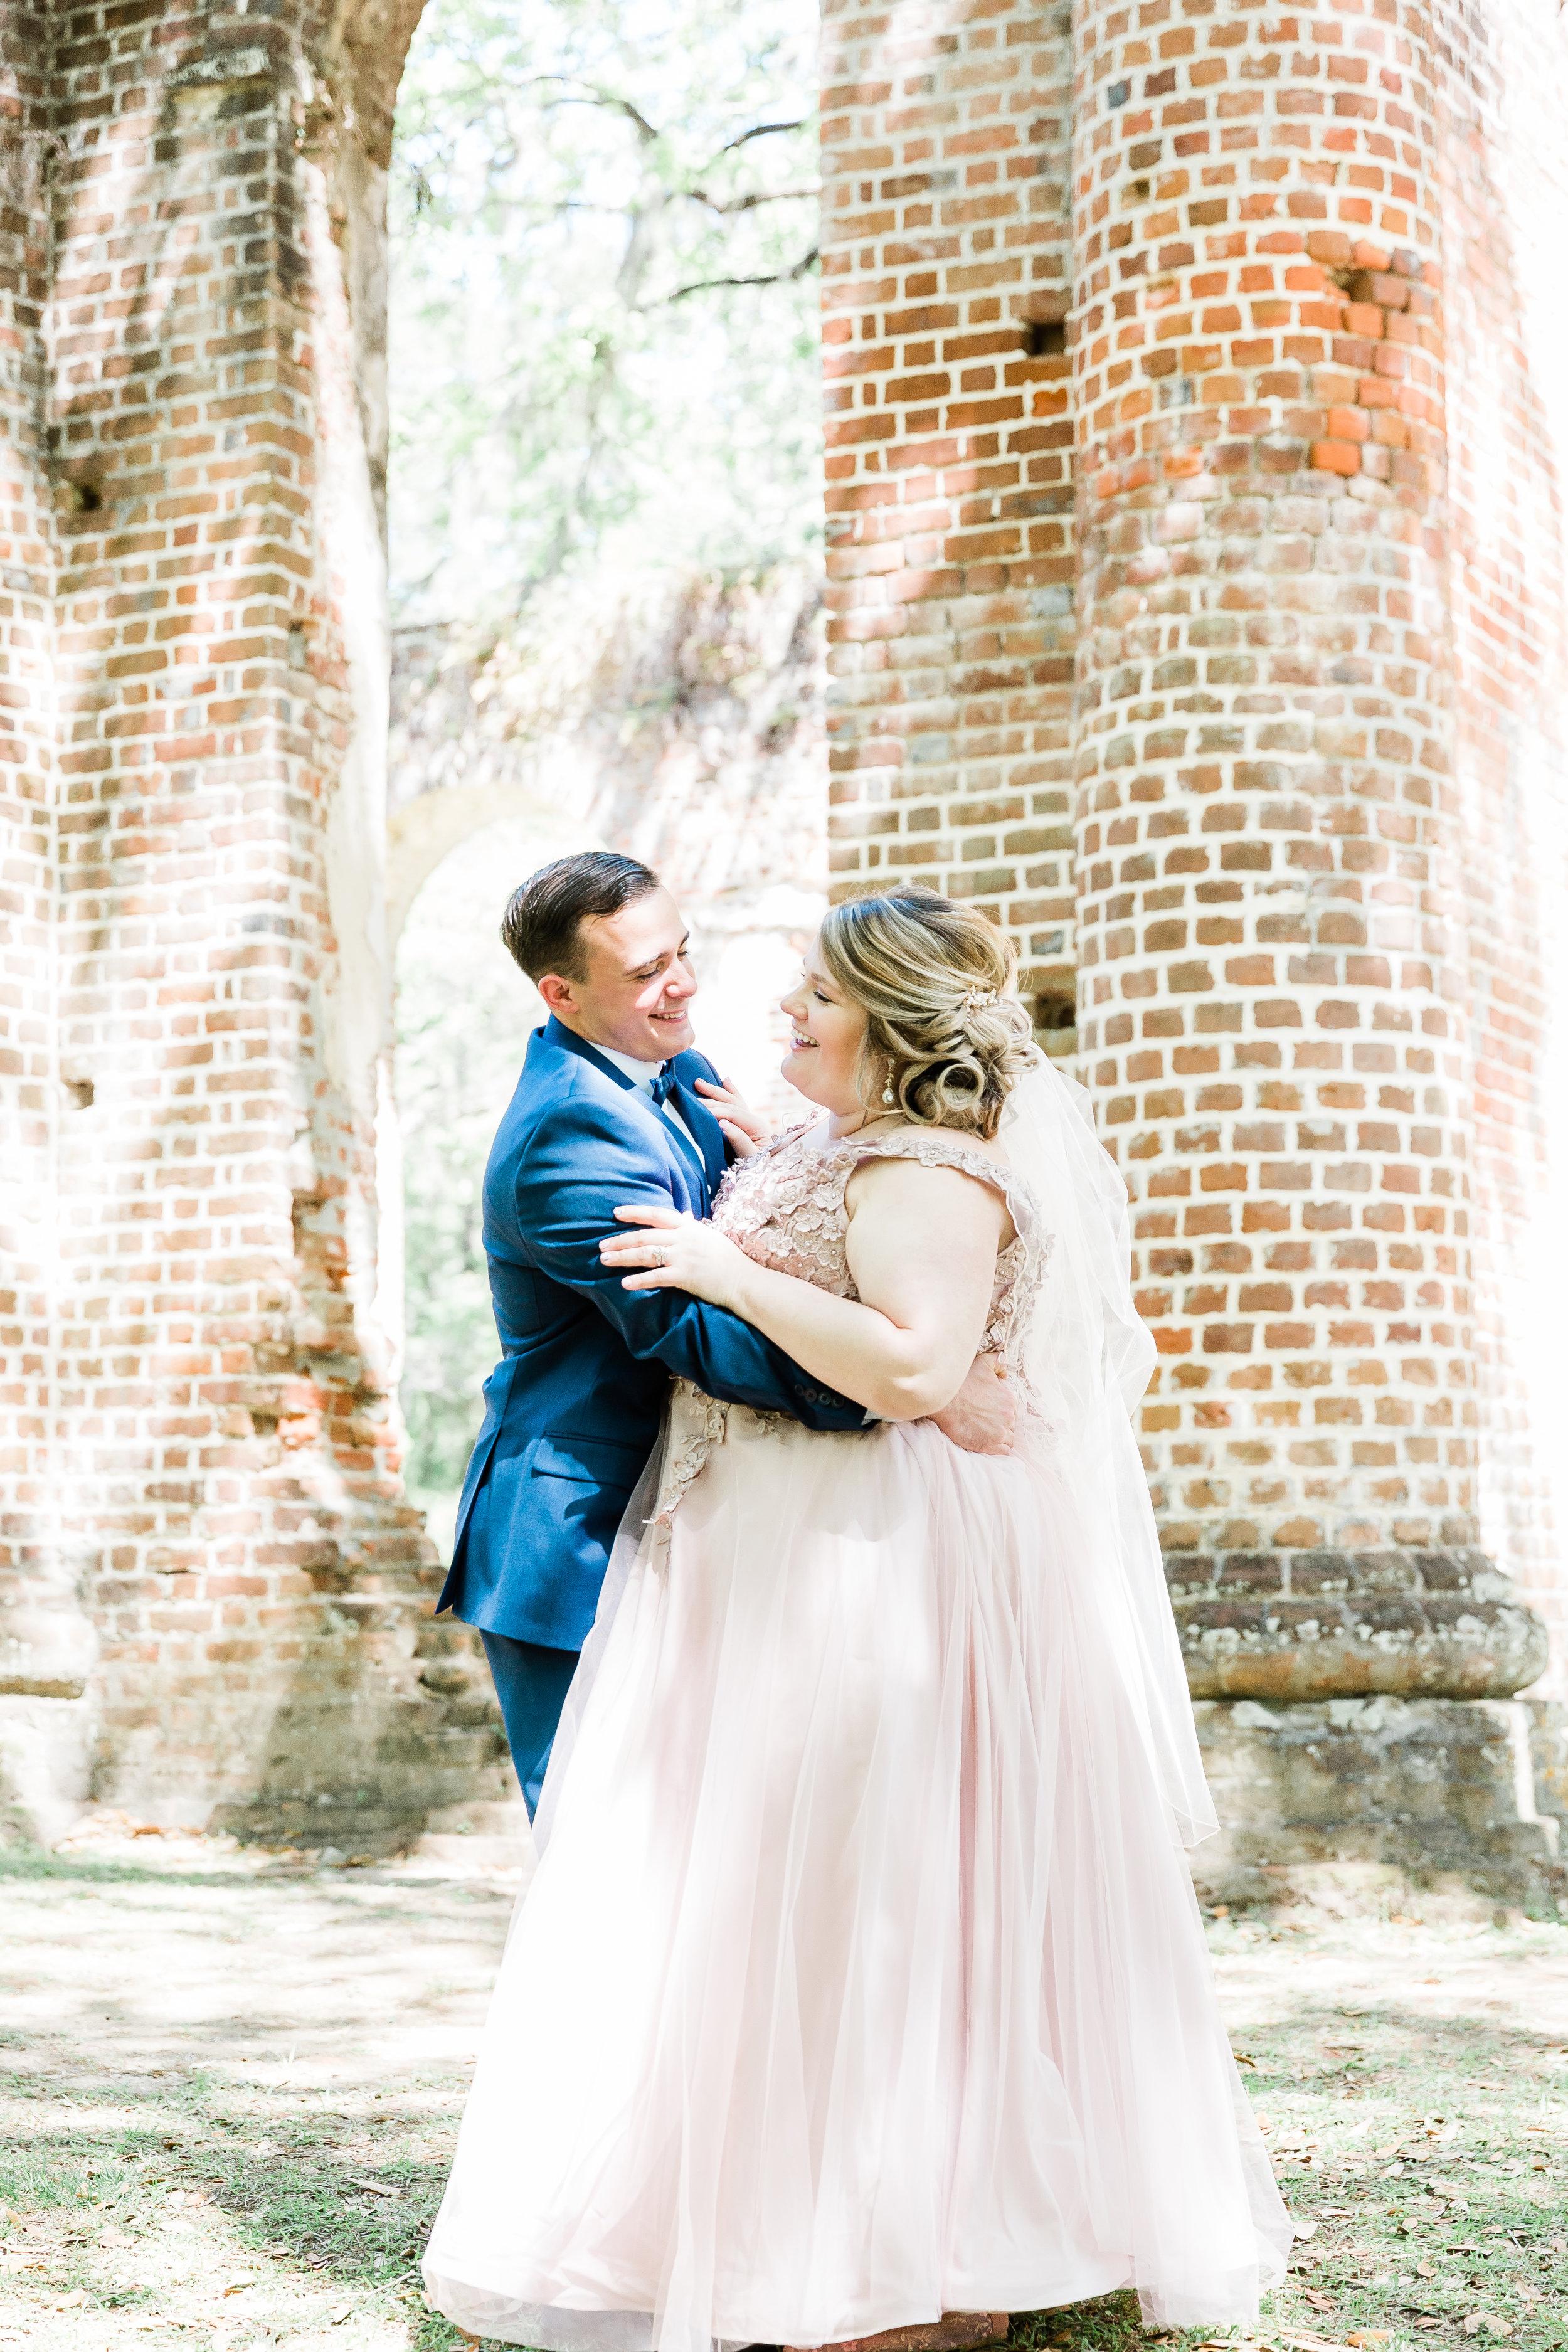 20190417-Southern Lens Photography-savannah family photographer- Ashley and Zack-old sheldon church ruins-201951.jpg